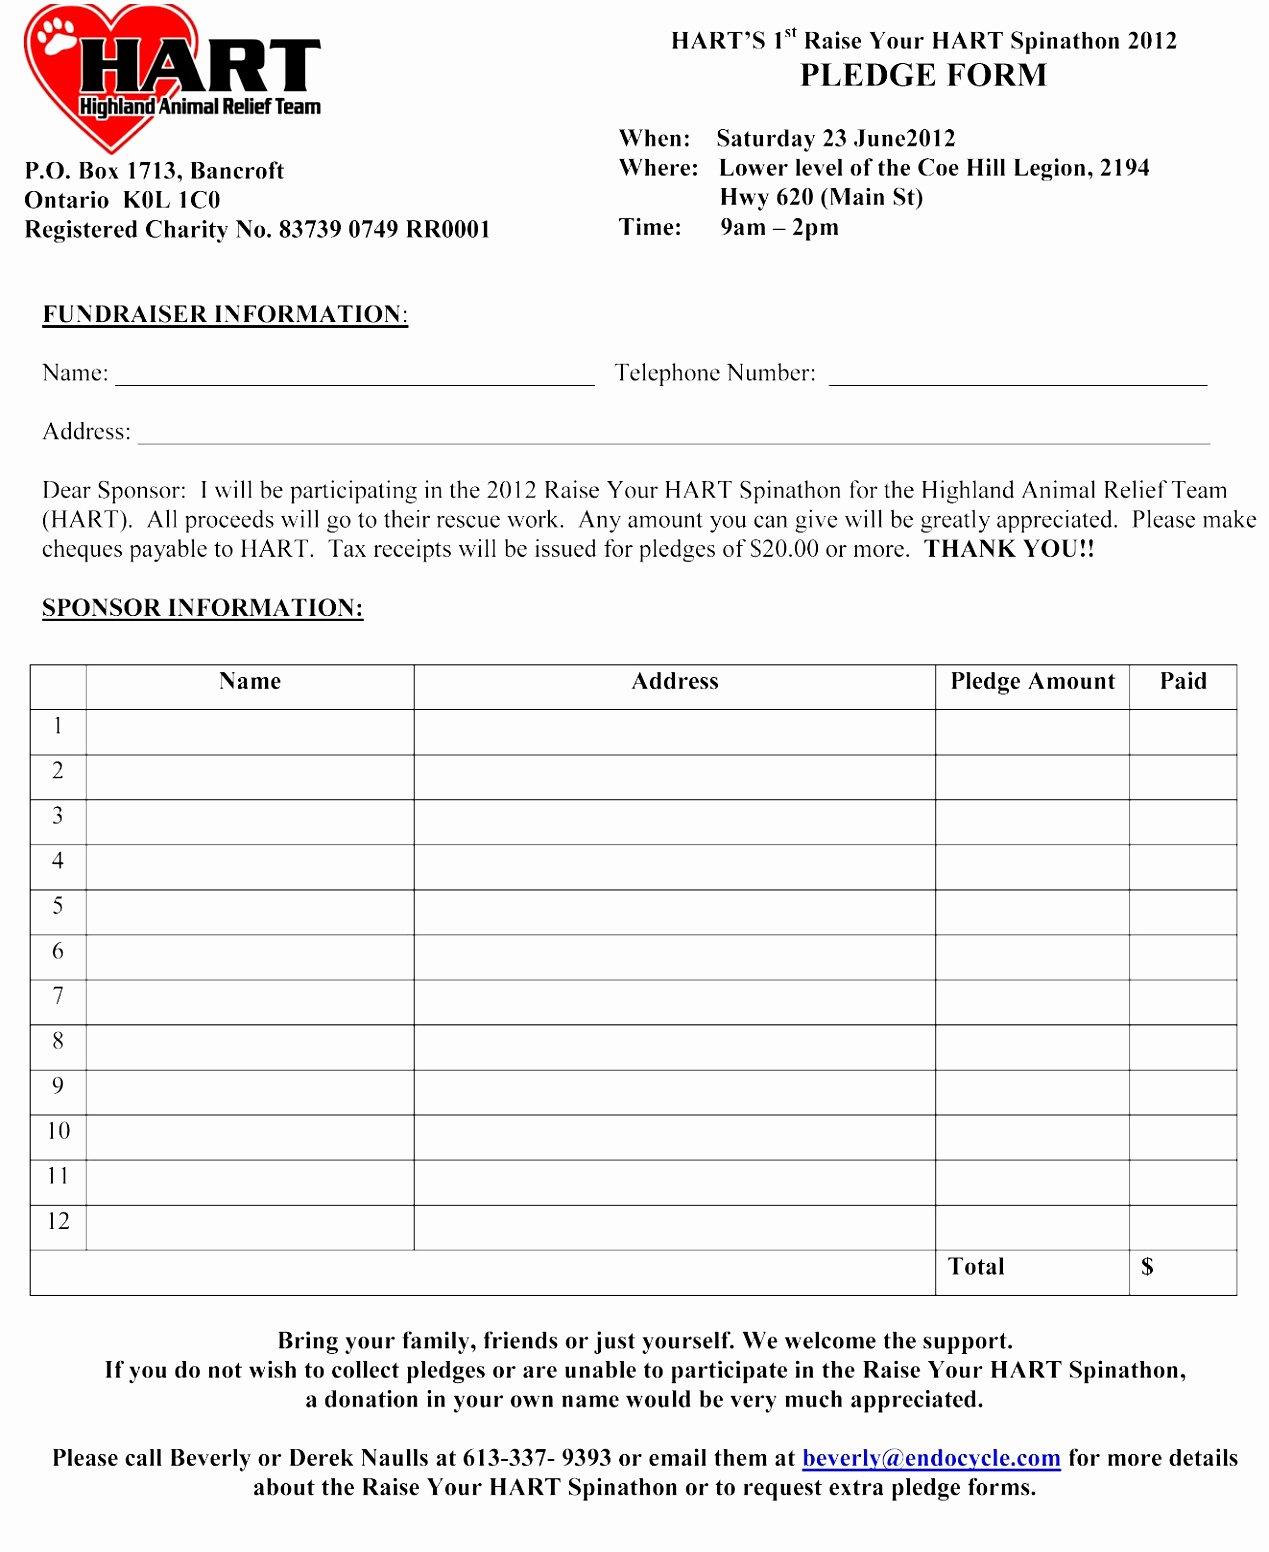 Fundraiser form Template Free Unique Fundraiser form Template Free – Versatolelive